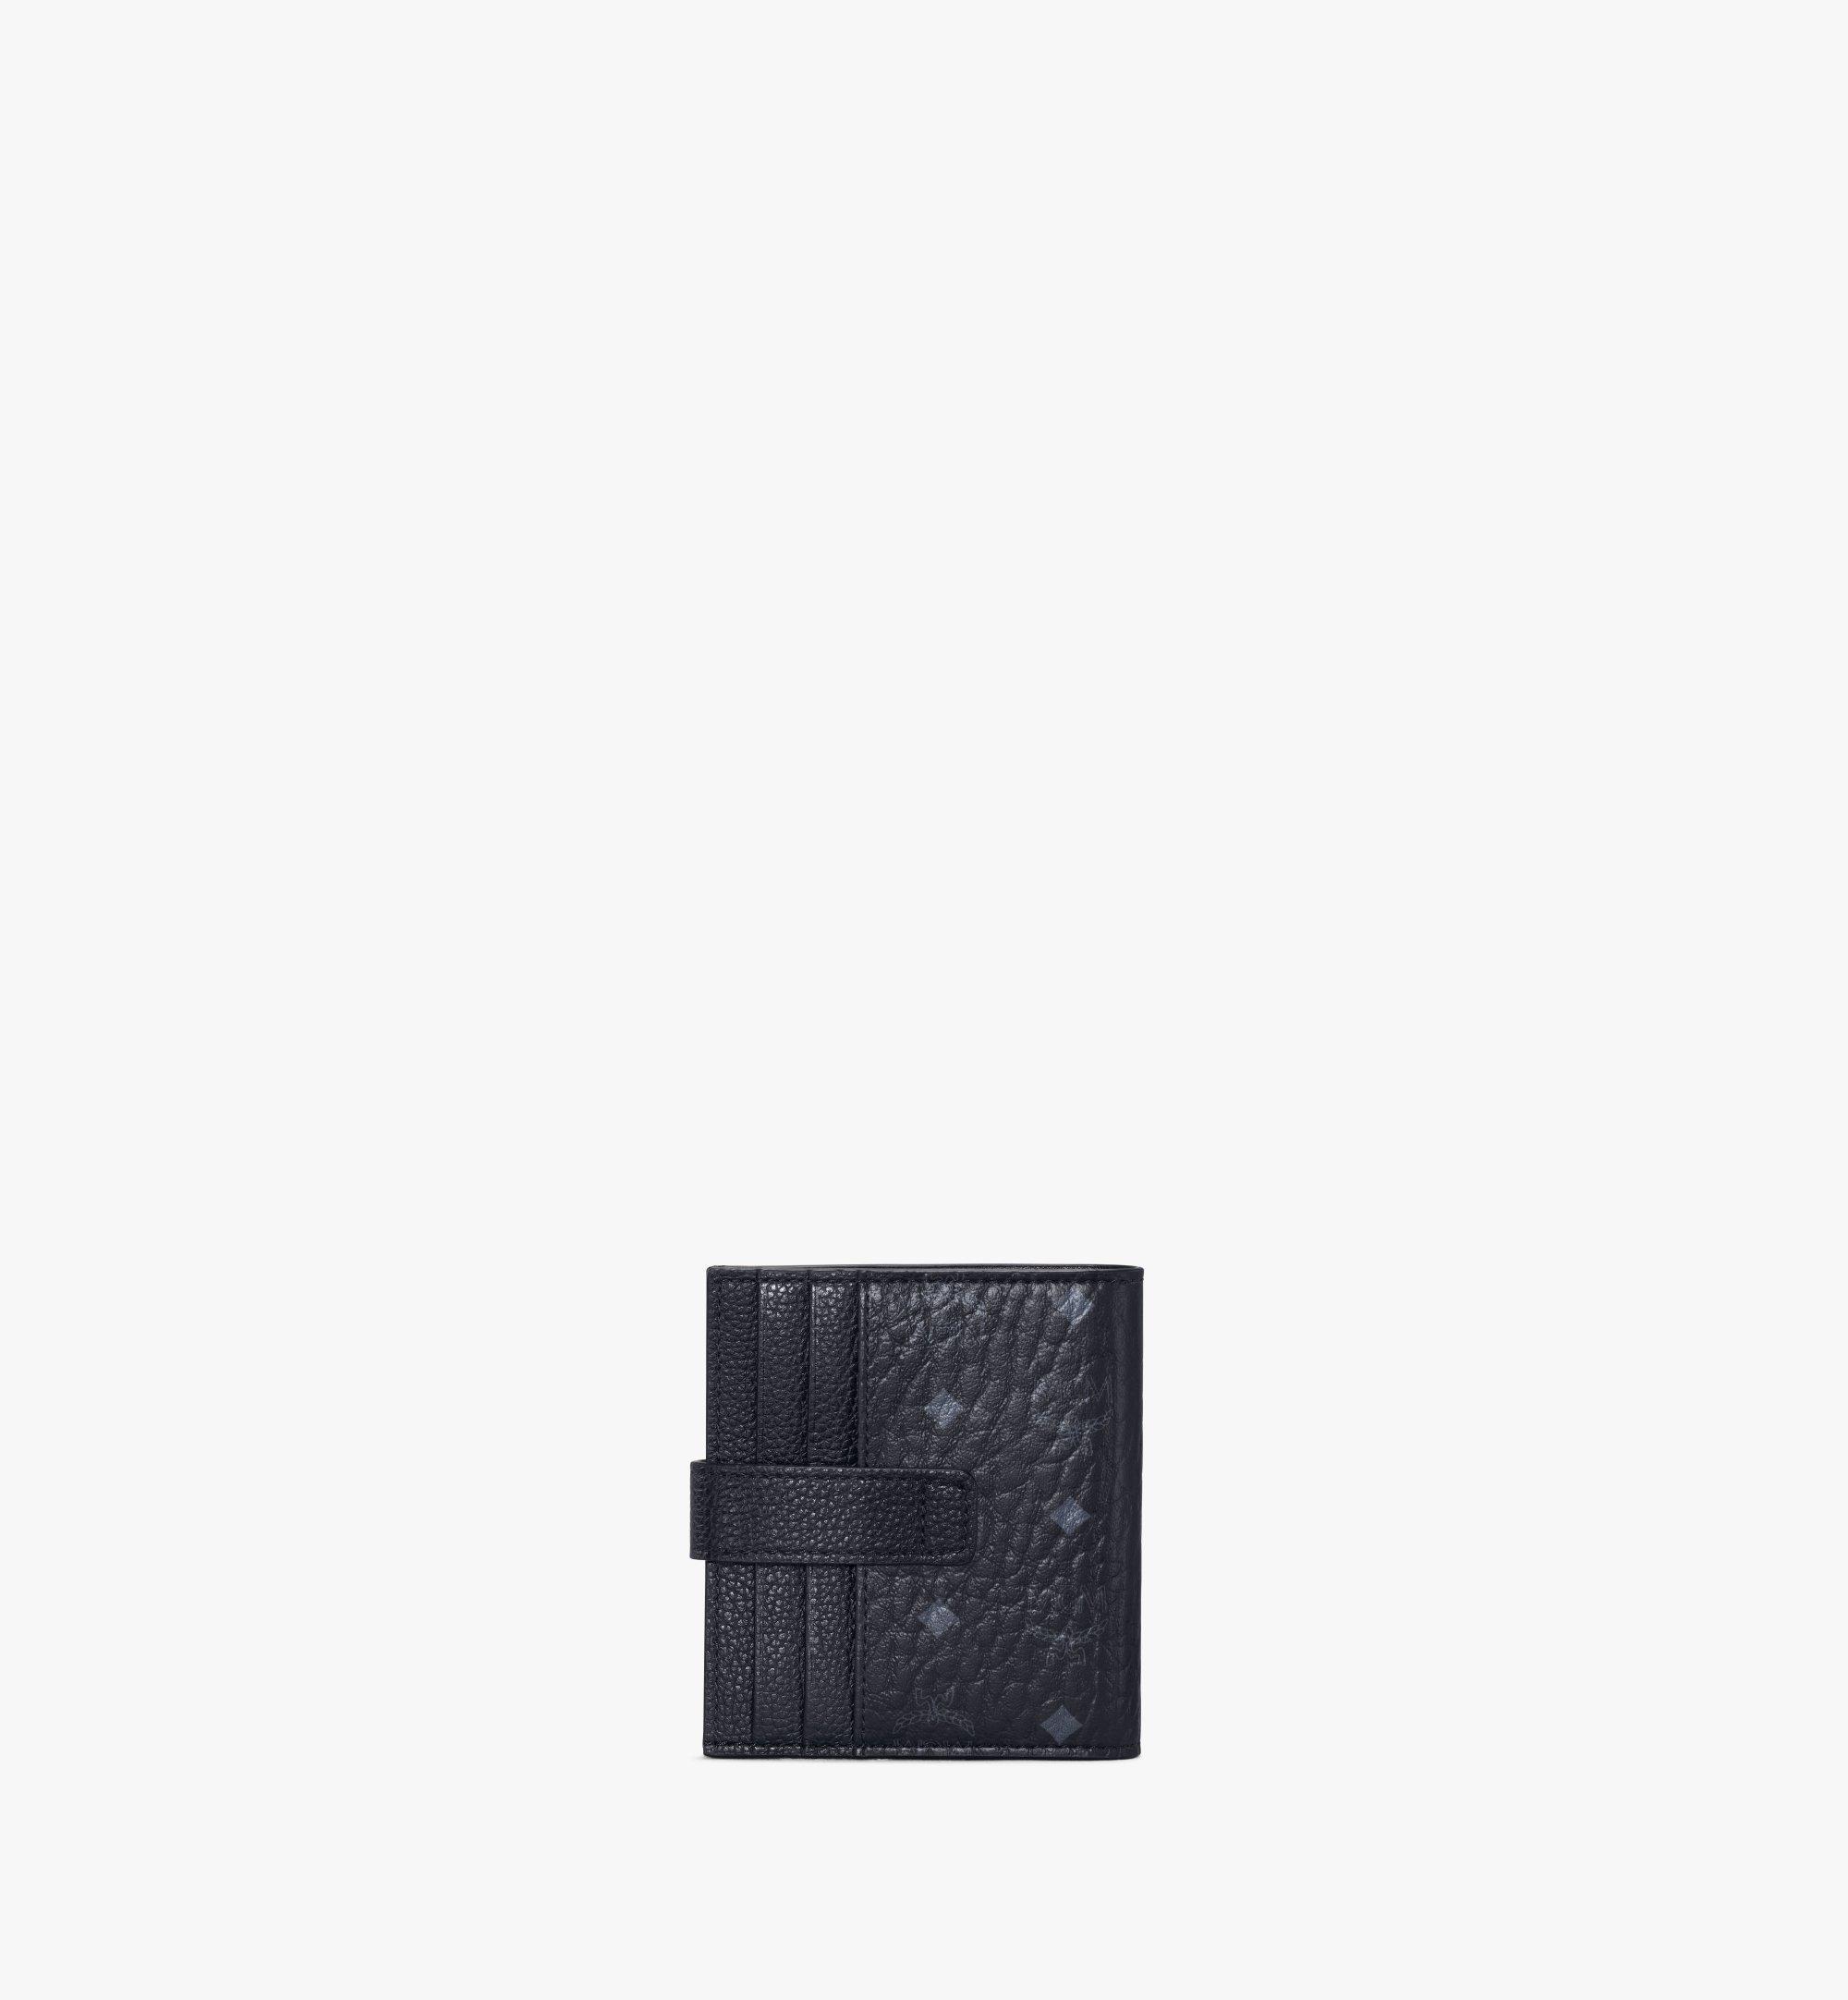 MCM 二つ折り カードウォレット - ヴィセトス レザー ミックス Black MXSAAVI08BK001 ほかの角度から見る 2